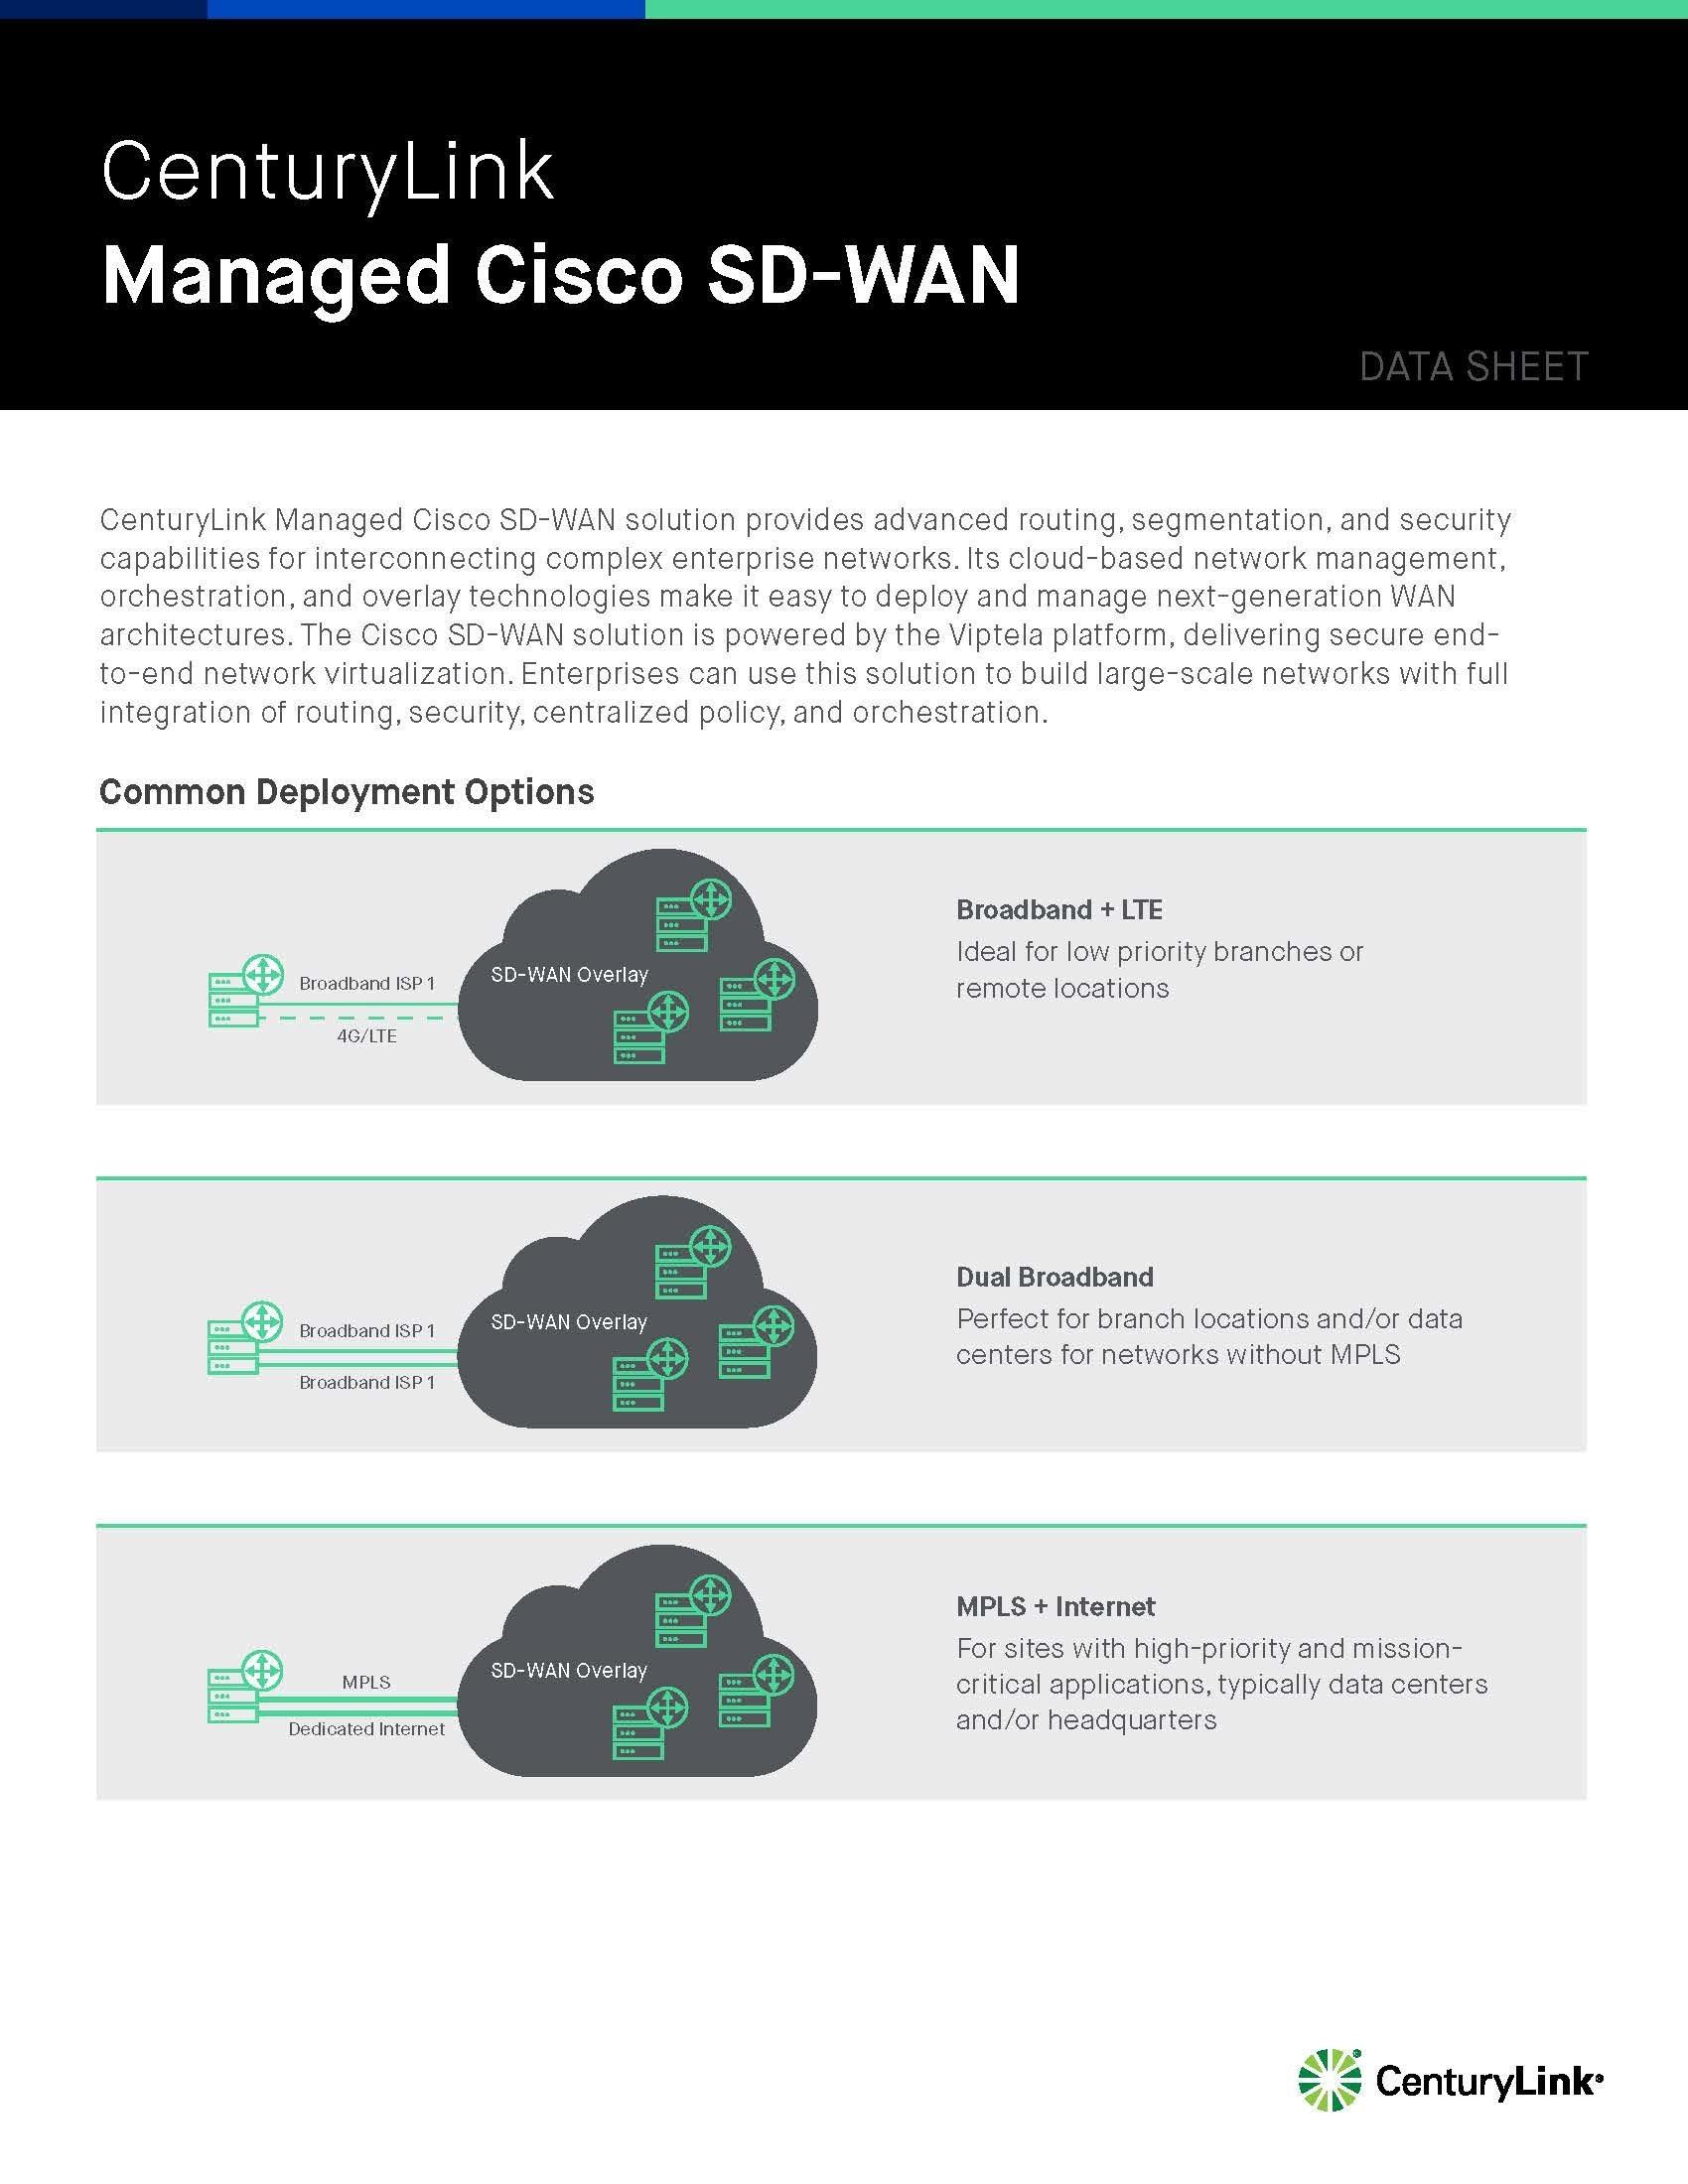 CenturyLink launches Managed Cisco SD-WAN